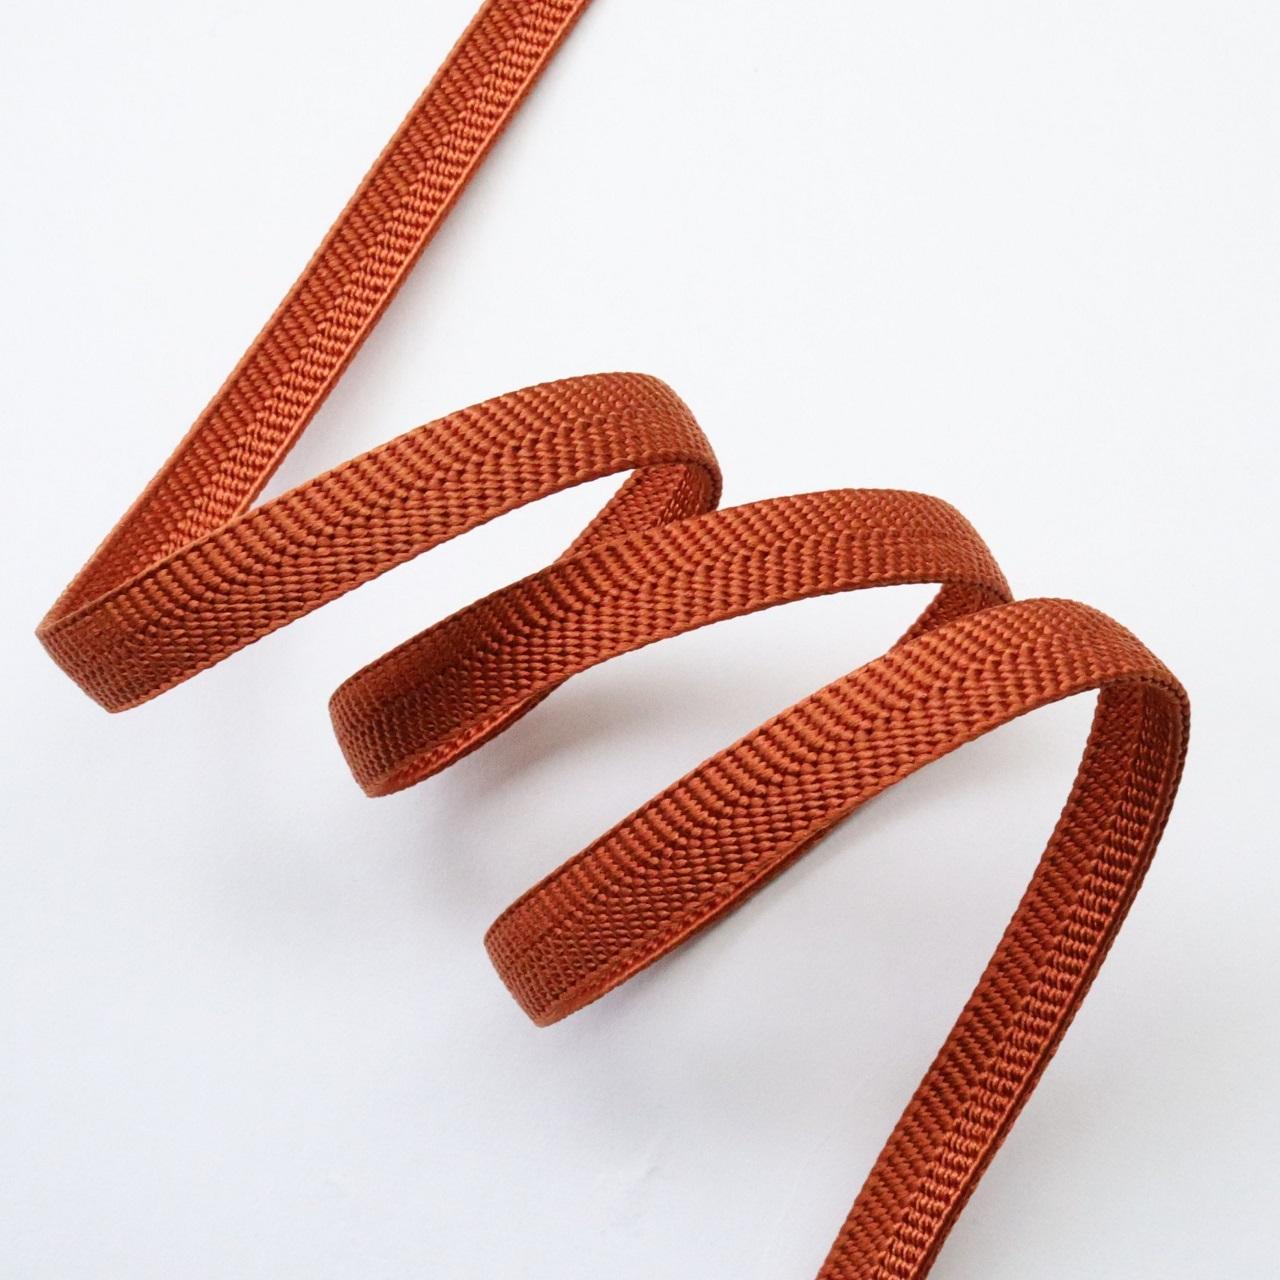 【帯締め】正絹三分紐 無地 褐色